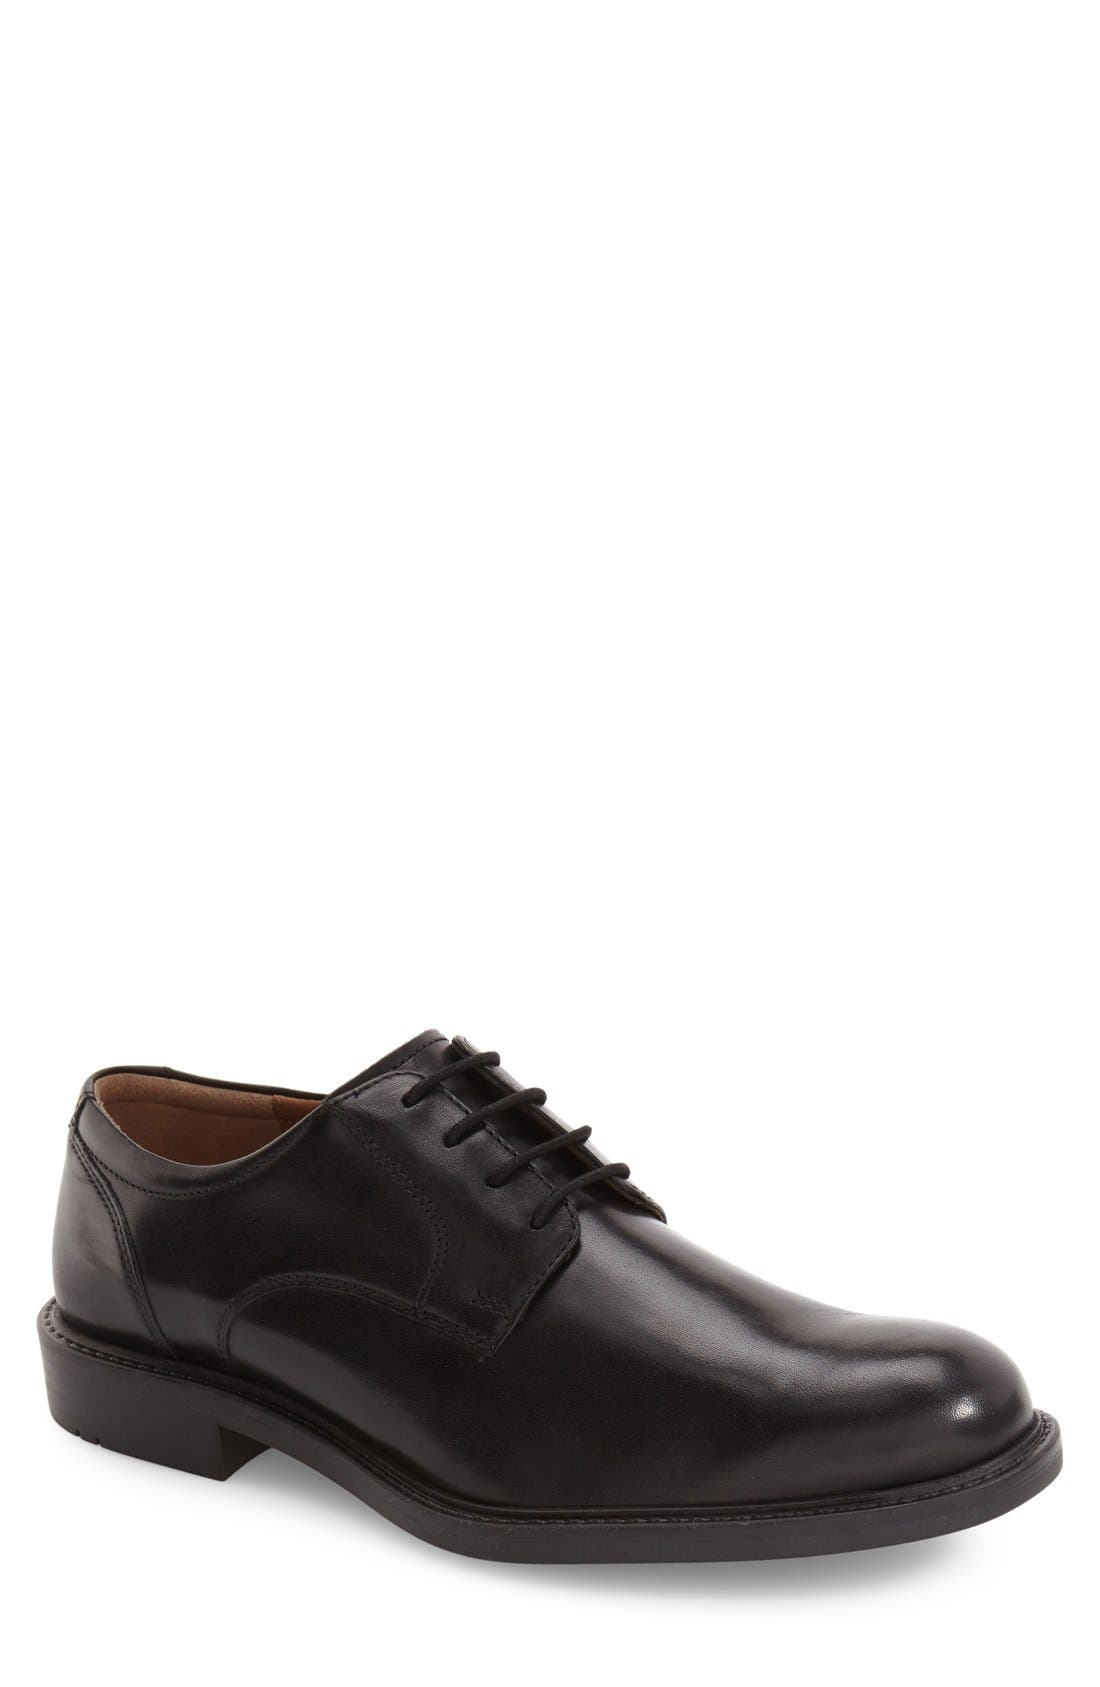 JOHNSTON & MURPHY Tabor Plain Toe Derby, Main, color, BLACK LEATHER